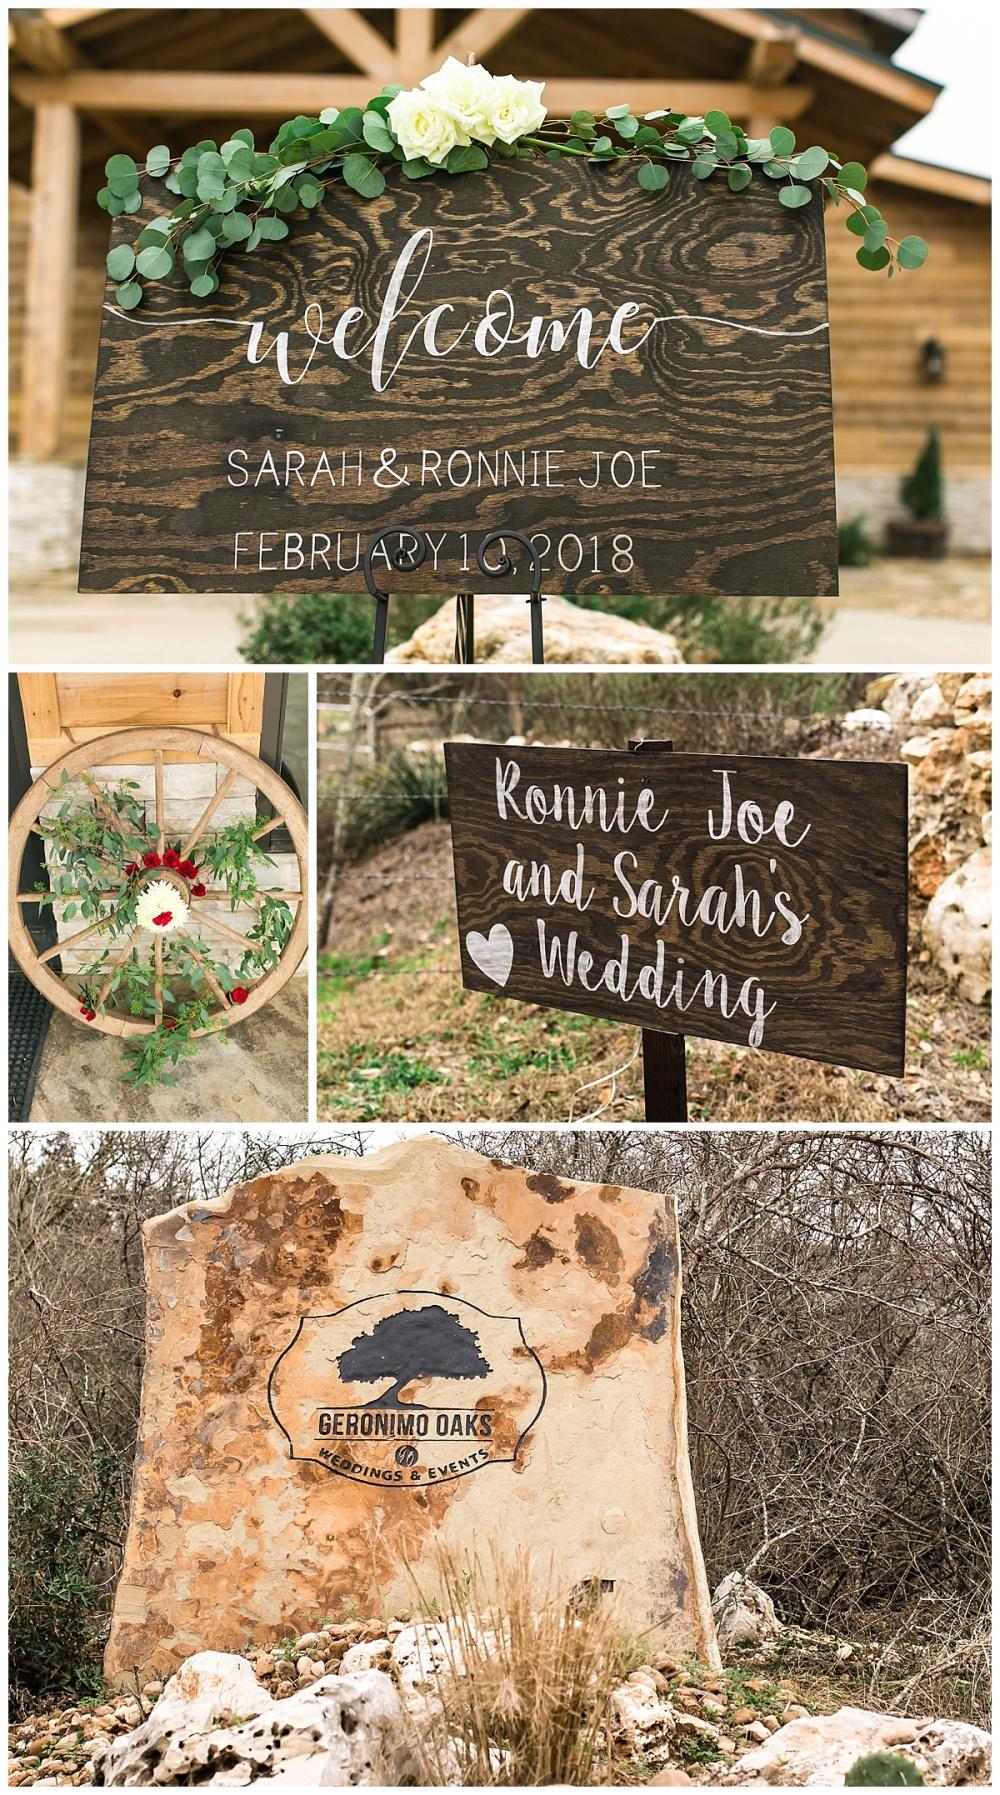 Carly-Barton-Photography-Geronimo-Oaks-Wedding-Venue-Texas-Hill-Country-Ronnie-Sarah_0075.jpg